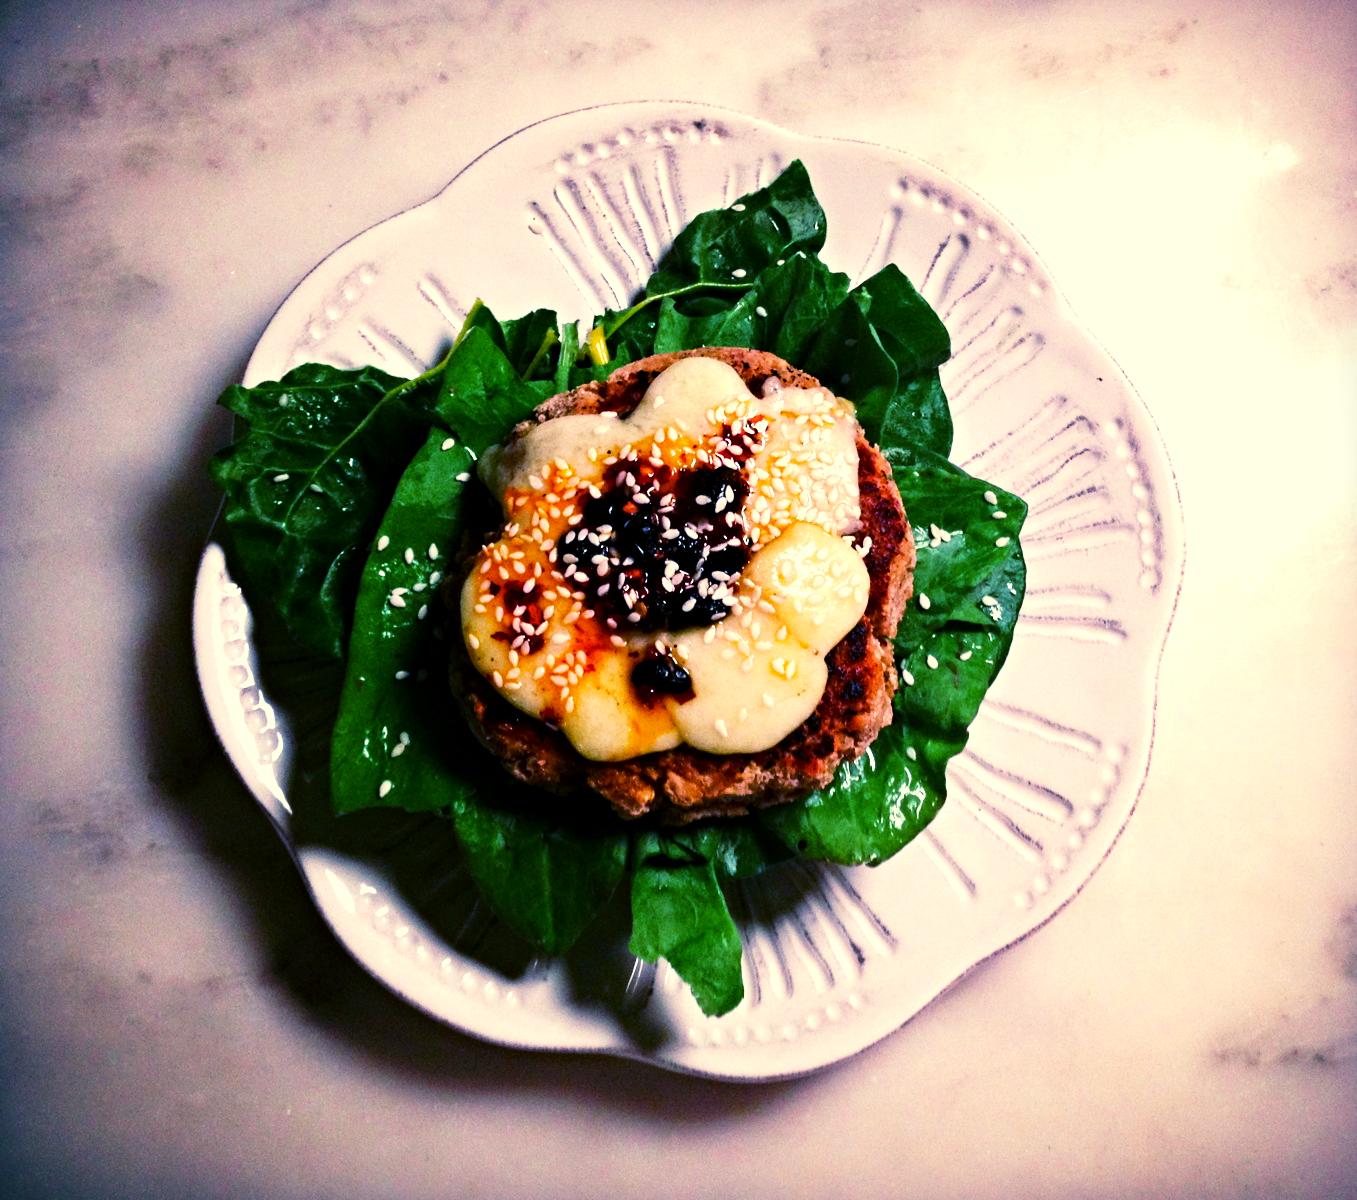 Detoxifying rosemary veggie burger recipe